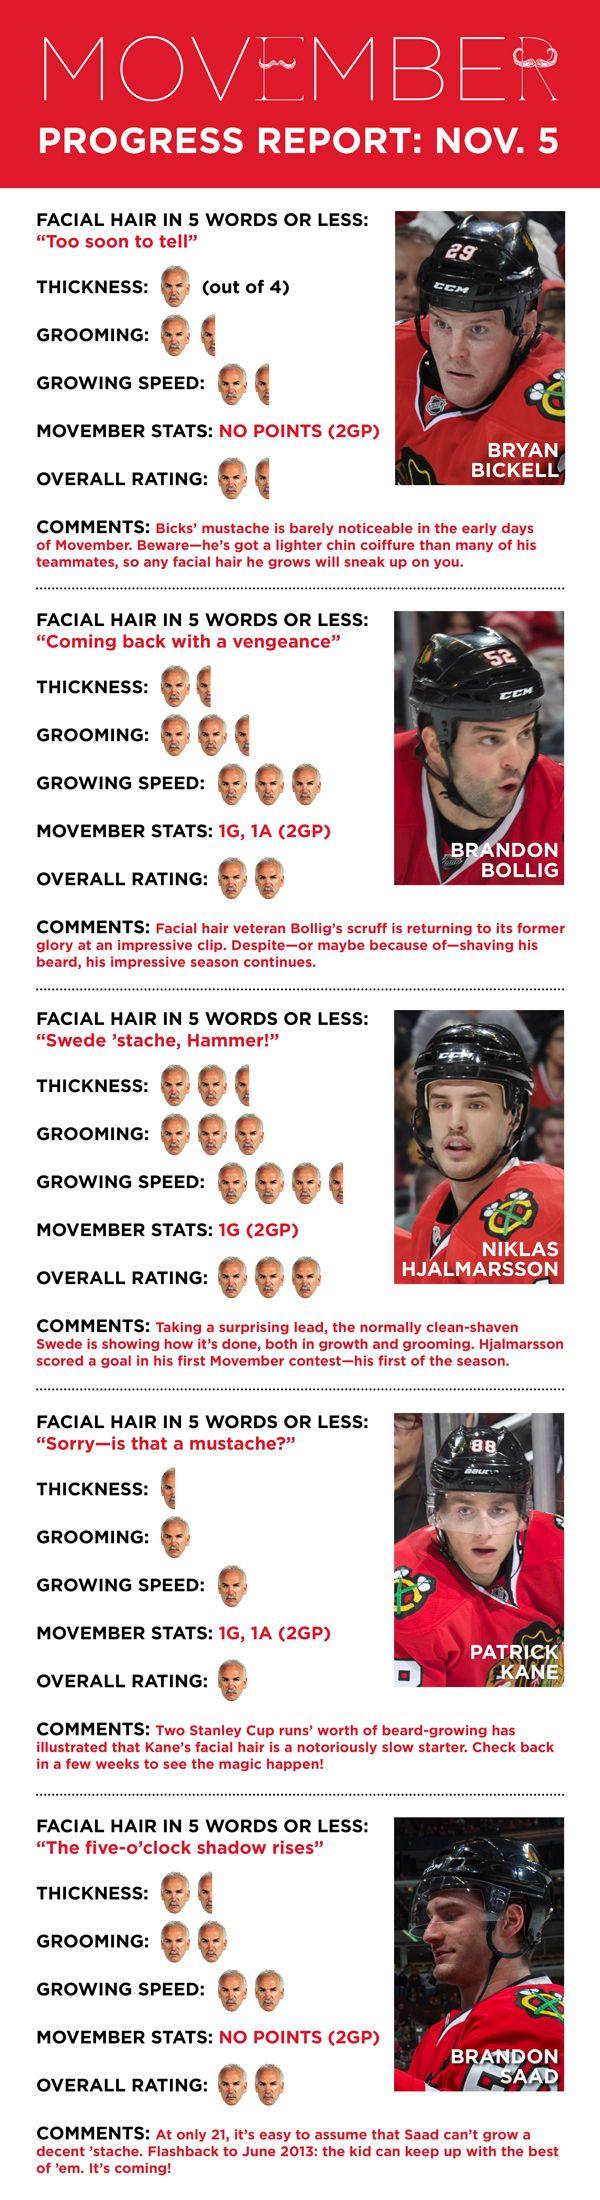 Movember Progress Report: Nov. 5, 2013 - Chicago Blackhawks - Blogs  This is hilarious!!